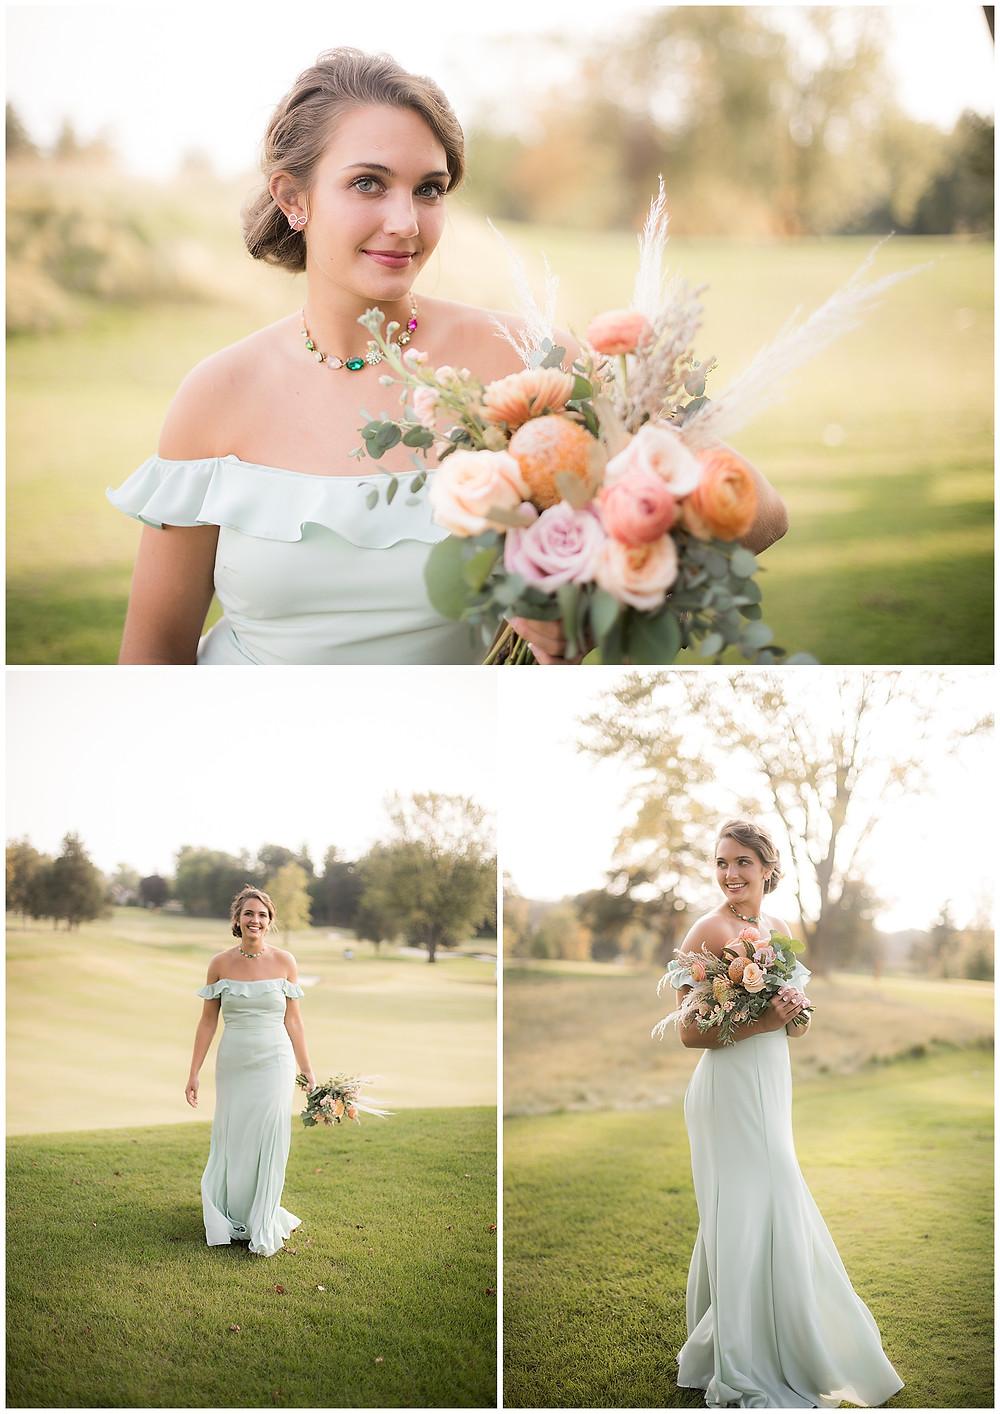 wisconsin wedding, wisconsin bride, wedding, wisconsin wedding venue, wedding venue, bridesmaid